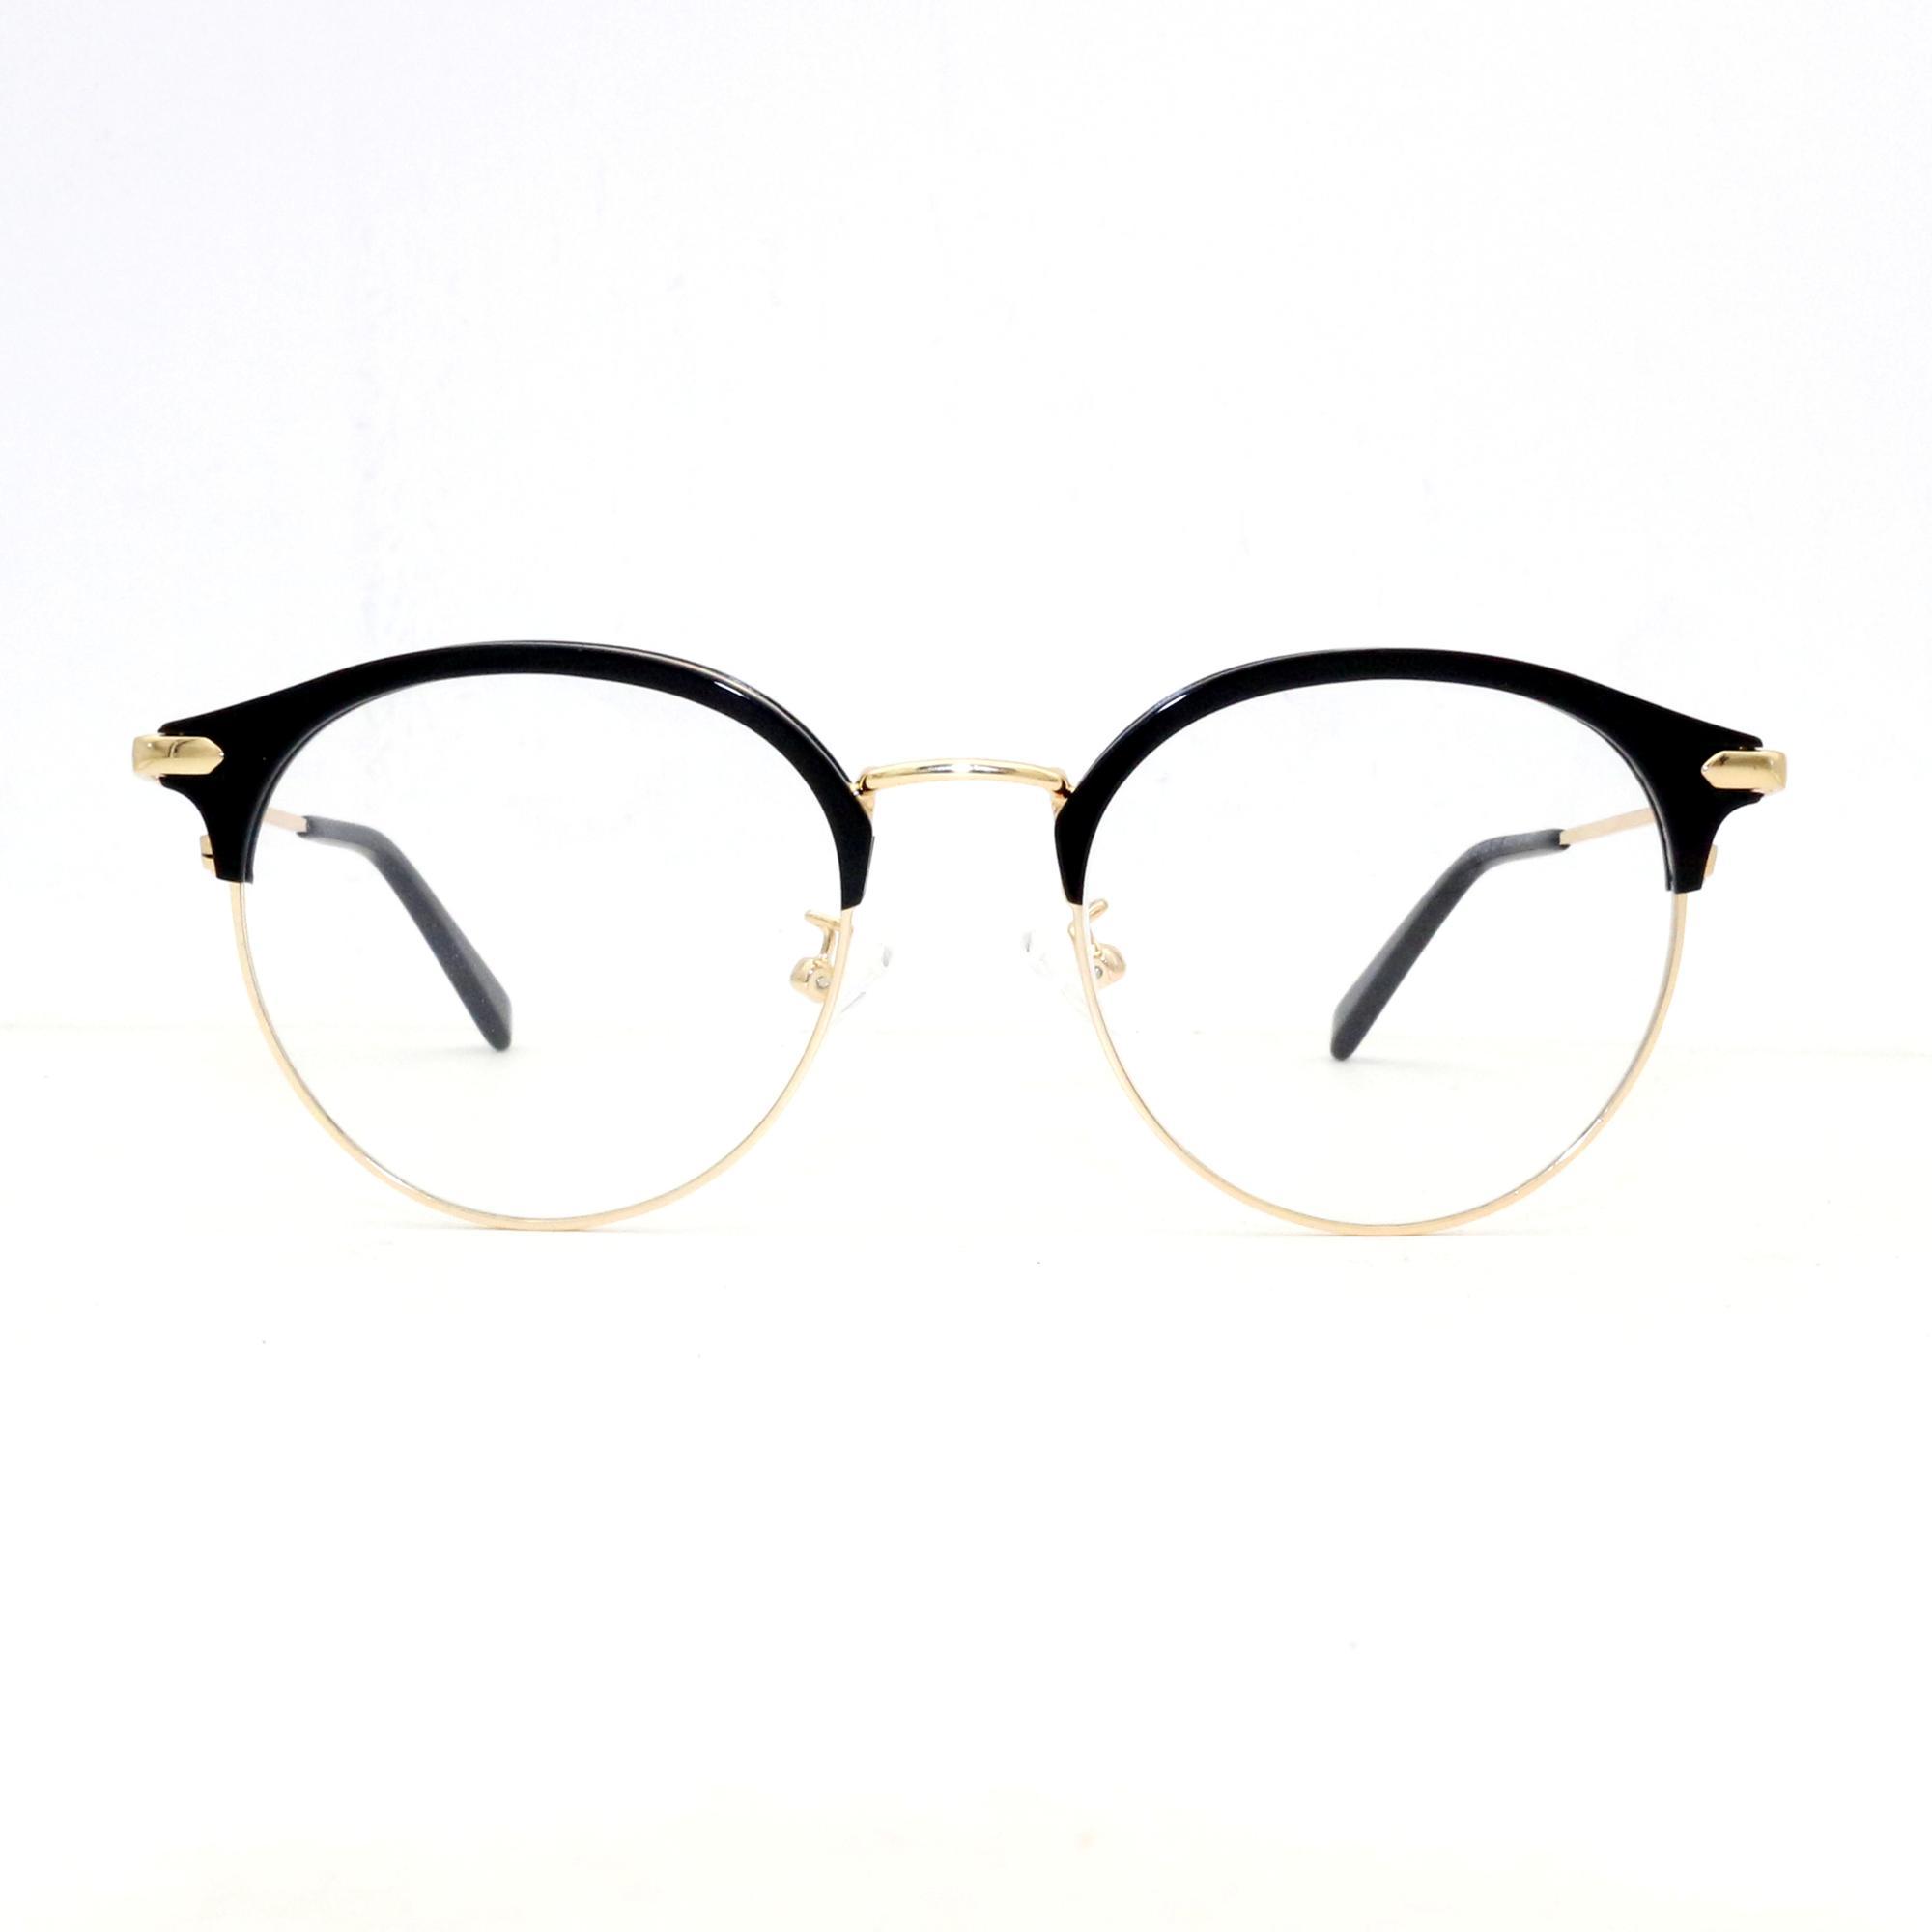 c06f3392f1 Retro acetate optical eyeglasses frames latest Mido design no MOQ YC high  quality wholesale stock eyewear